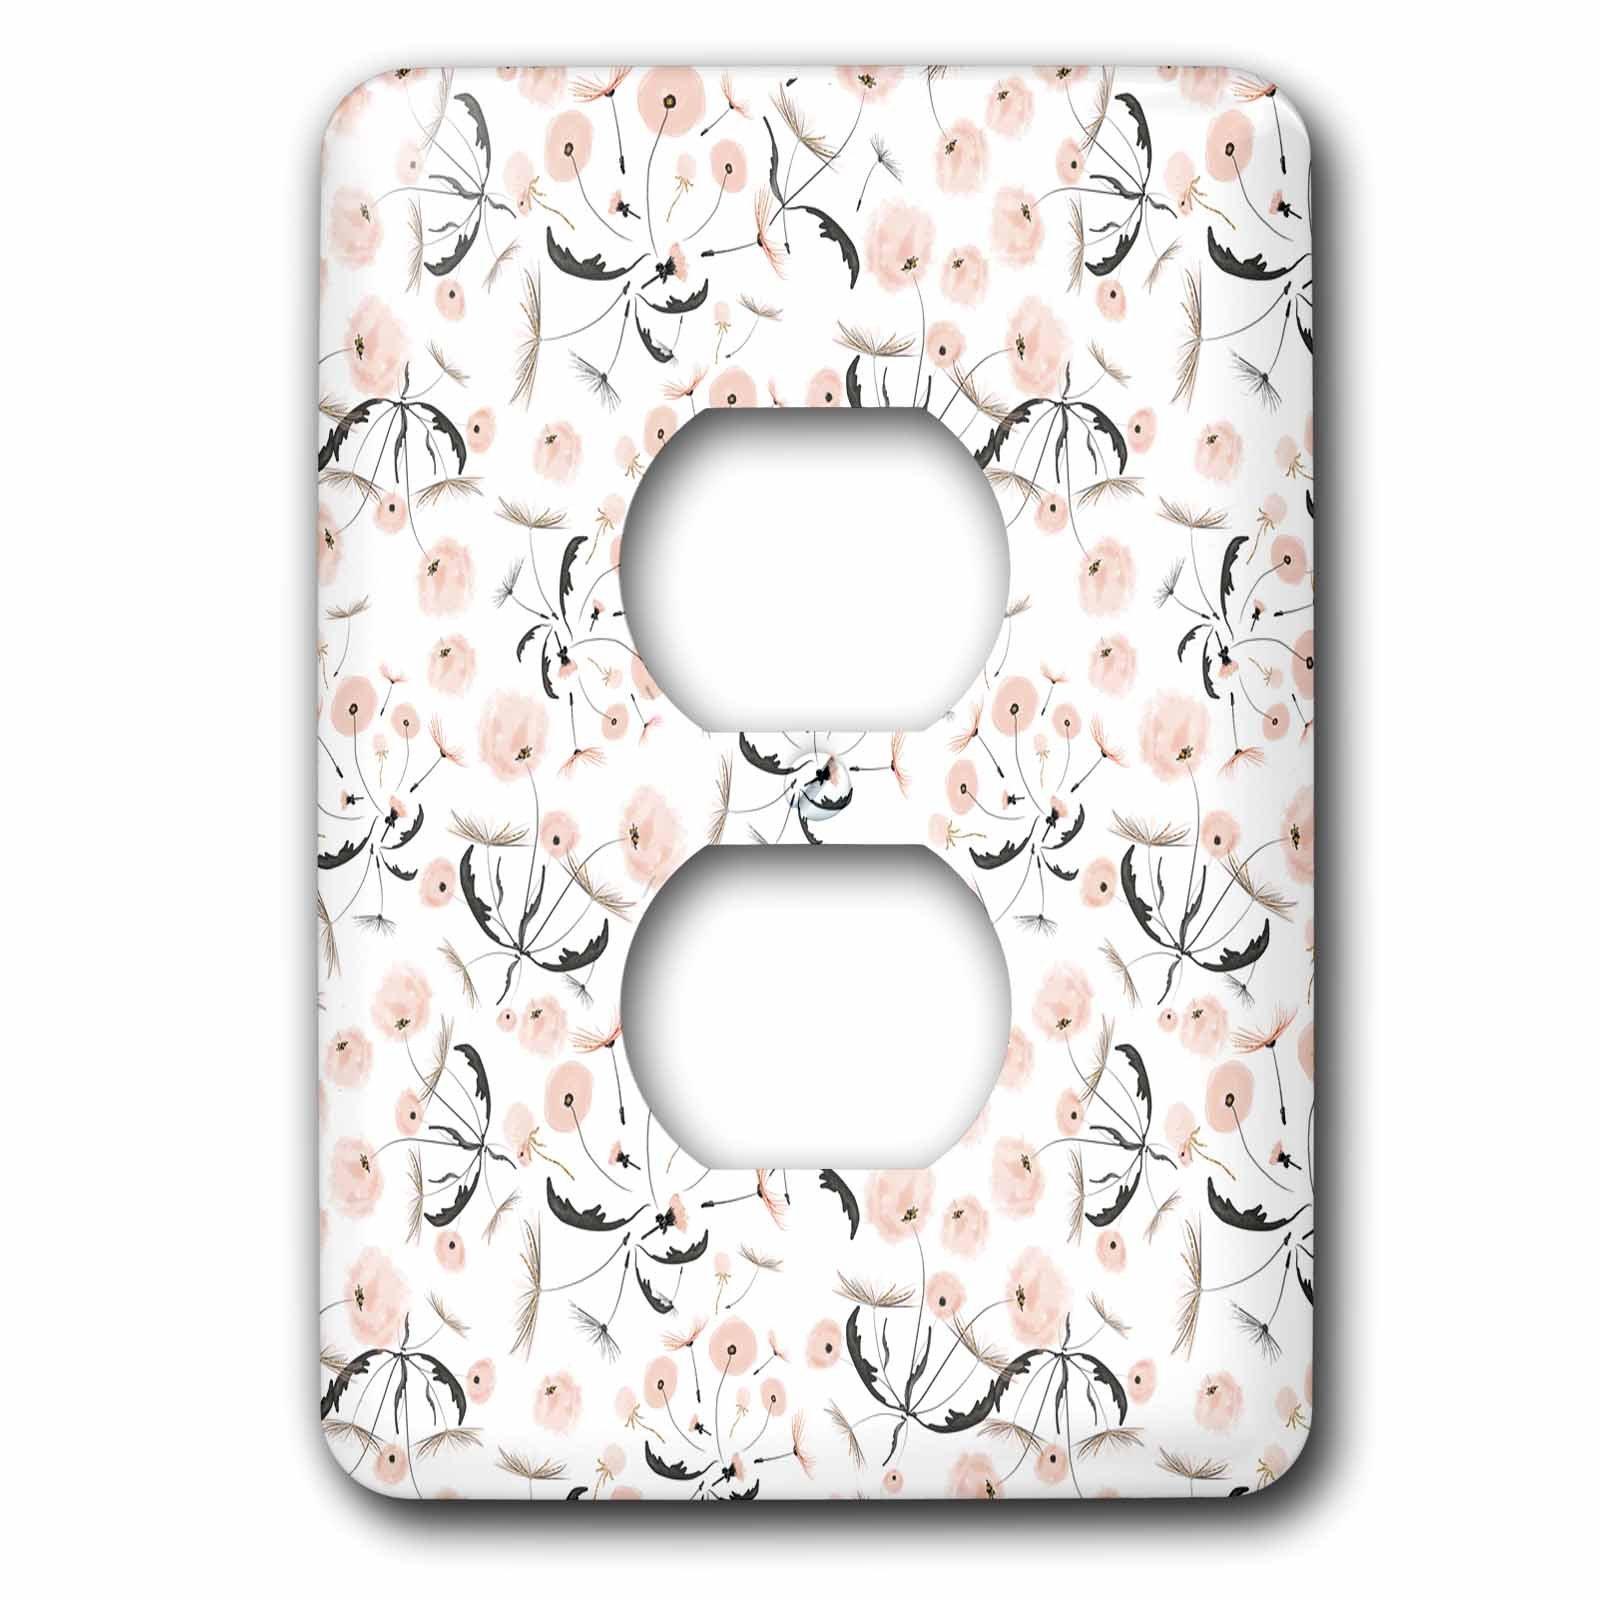 3dRose Uta Naumann Pattern - Luxury Shiny Elegant Rose Gold Dandelion Flower Pattern - Light Switch Covers - 2 plug outlet cover (lsp_272873_6)